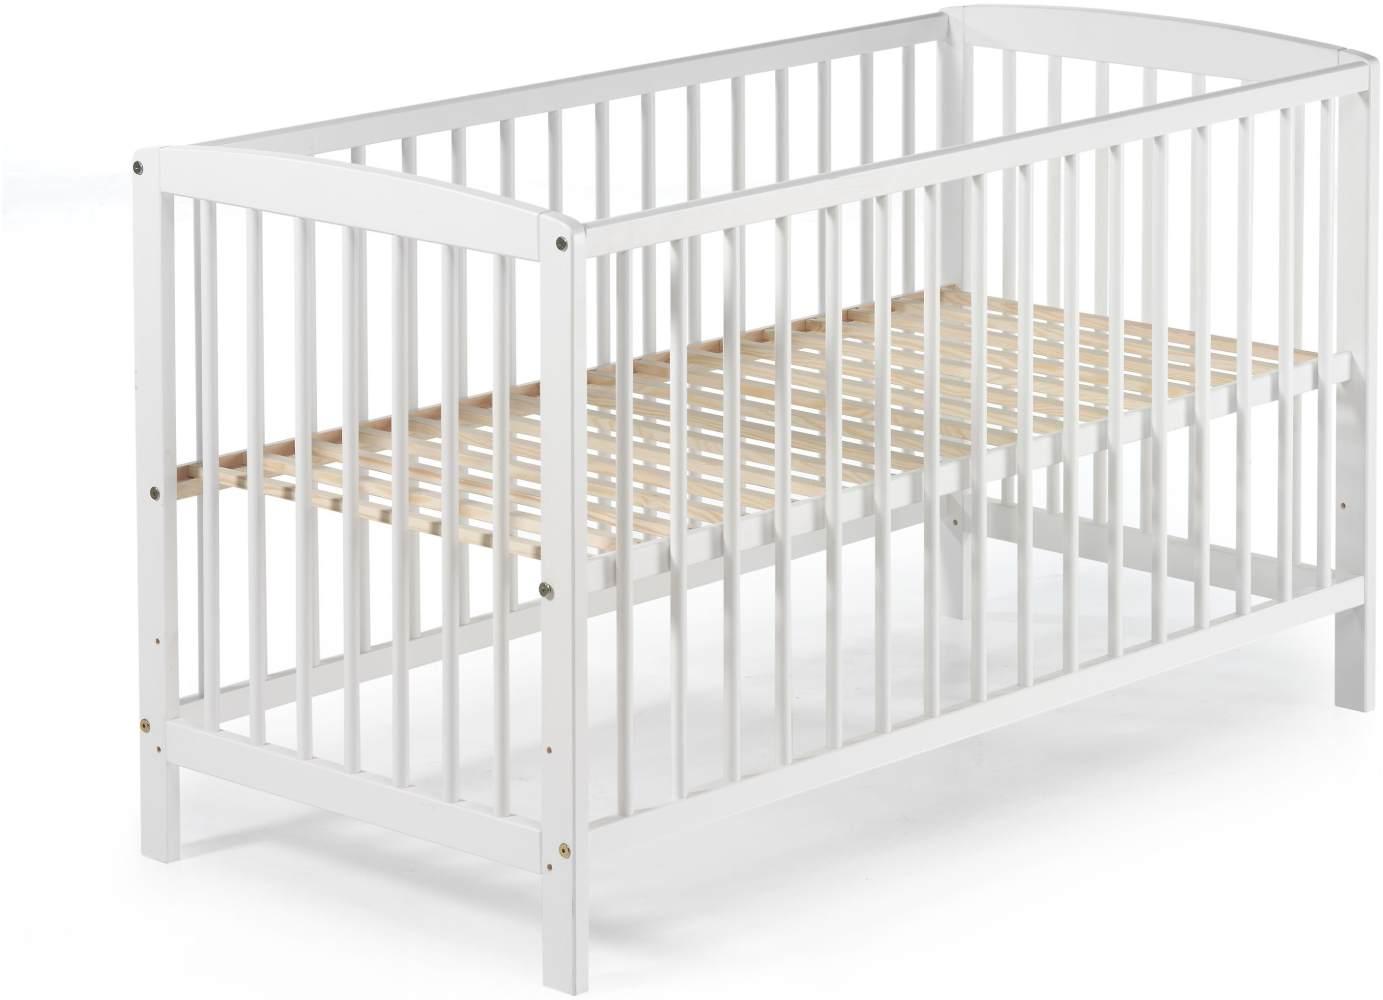 Schardt 'Felix' Kinderbett weiß, 60 x 120 cm, Lattenrost 3-fach höhenverstellbar Bild 1